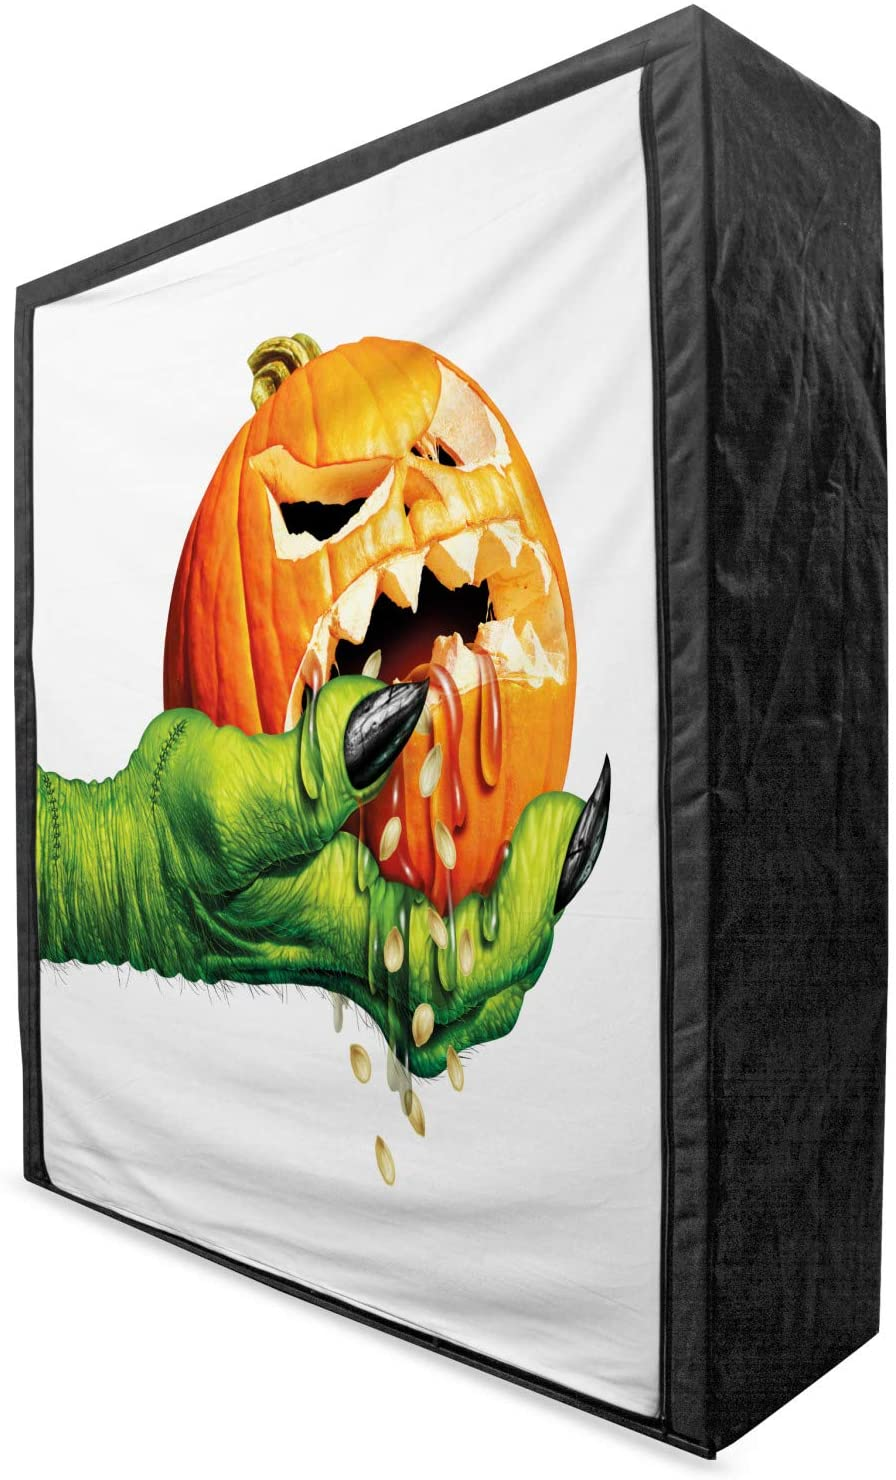 Lunarable Pumpkin Portable Fabric Wardrobe, Halloween Themed Green Monster Hand Presents Jack o' Lantern Dripping Eerie Liquid, Clothing Organizer and Storage Closet with Shelves, 59